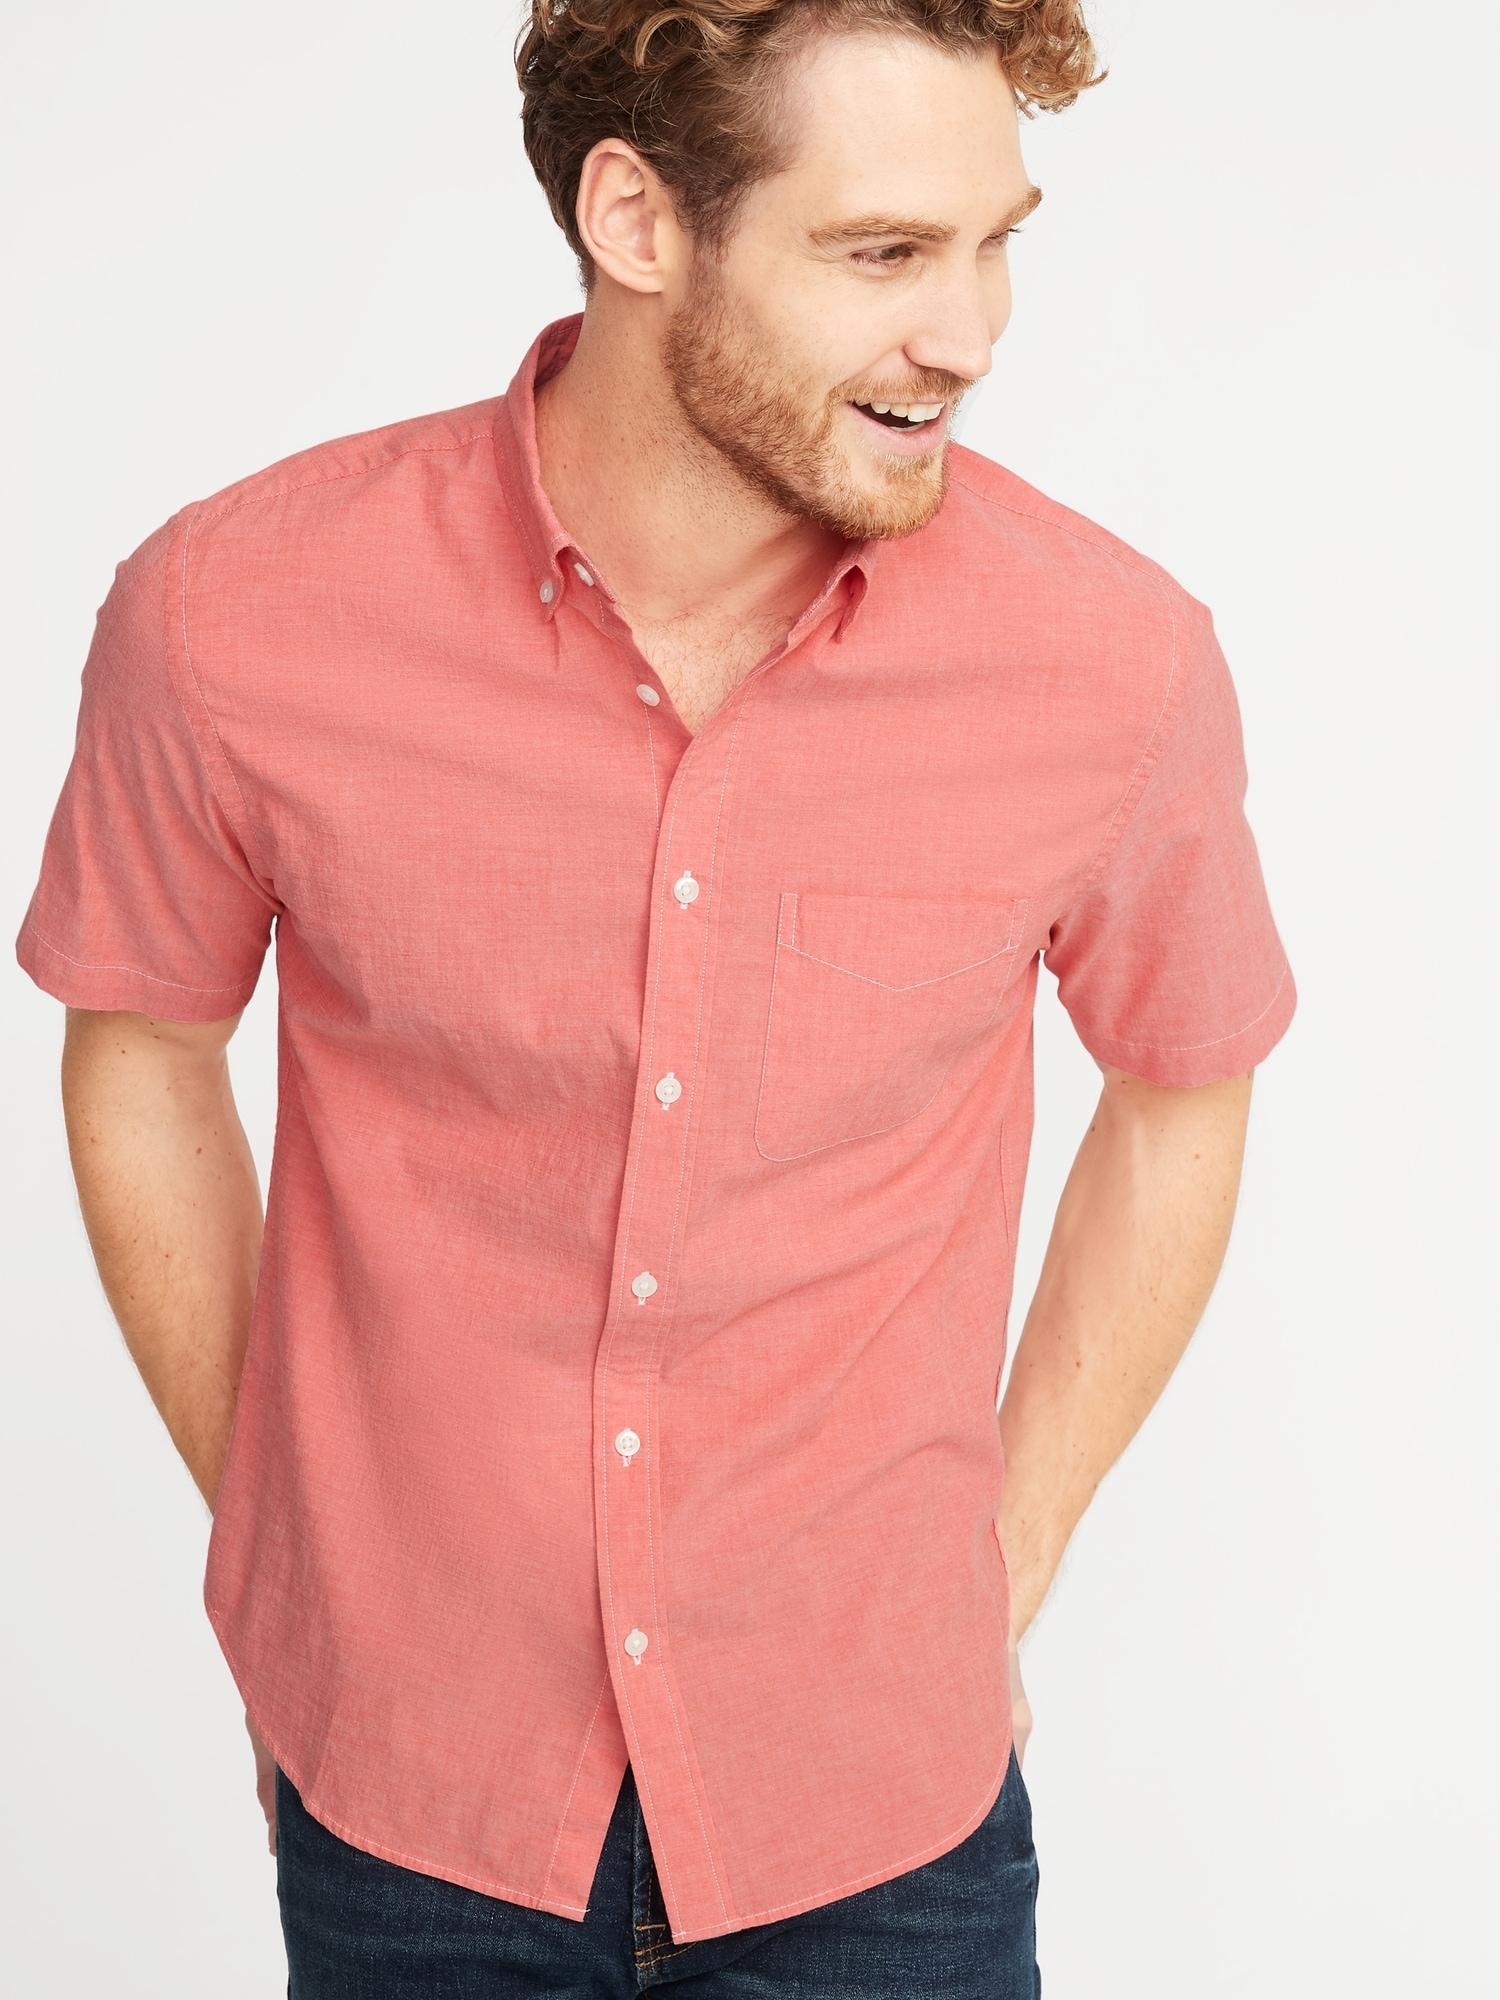 2f63320053d63 Slim-Fit Built-In Flex Everyday Shirt for Men